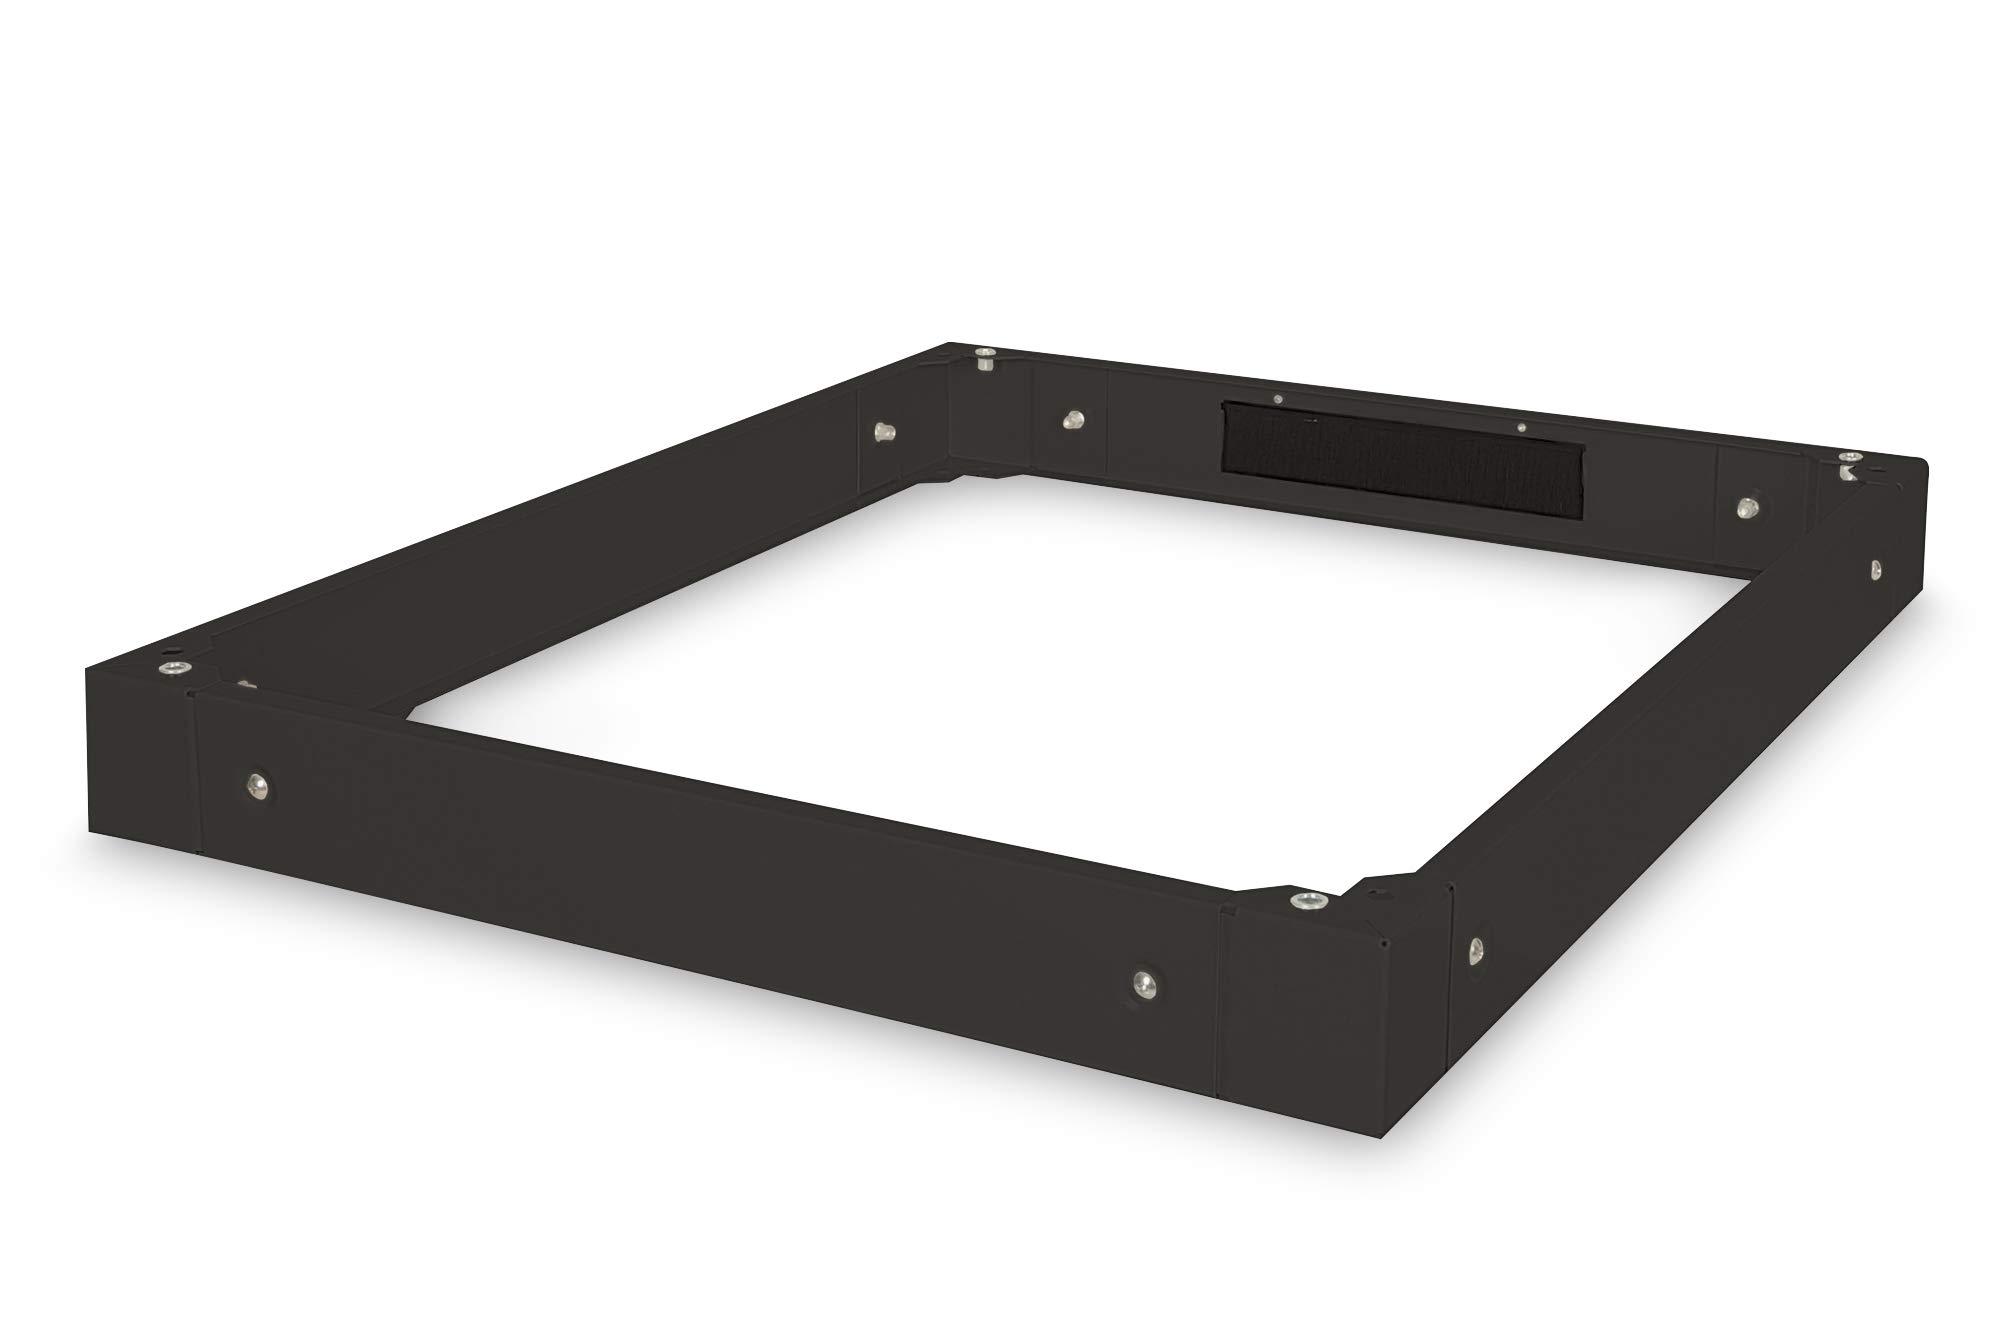 Digitus Base for Digitus Network Cabinets 1000Black RAL 9005